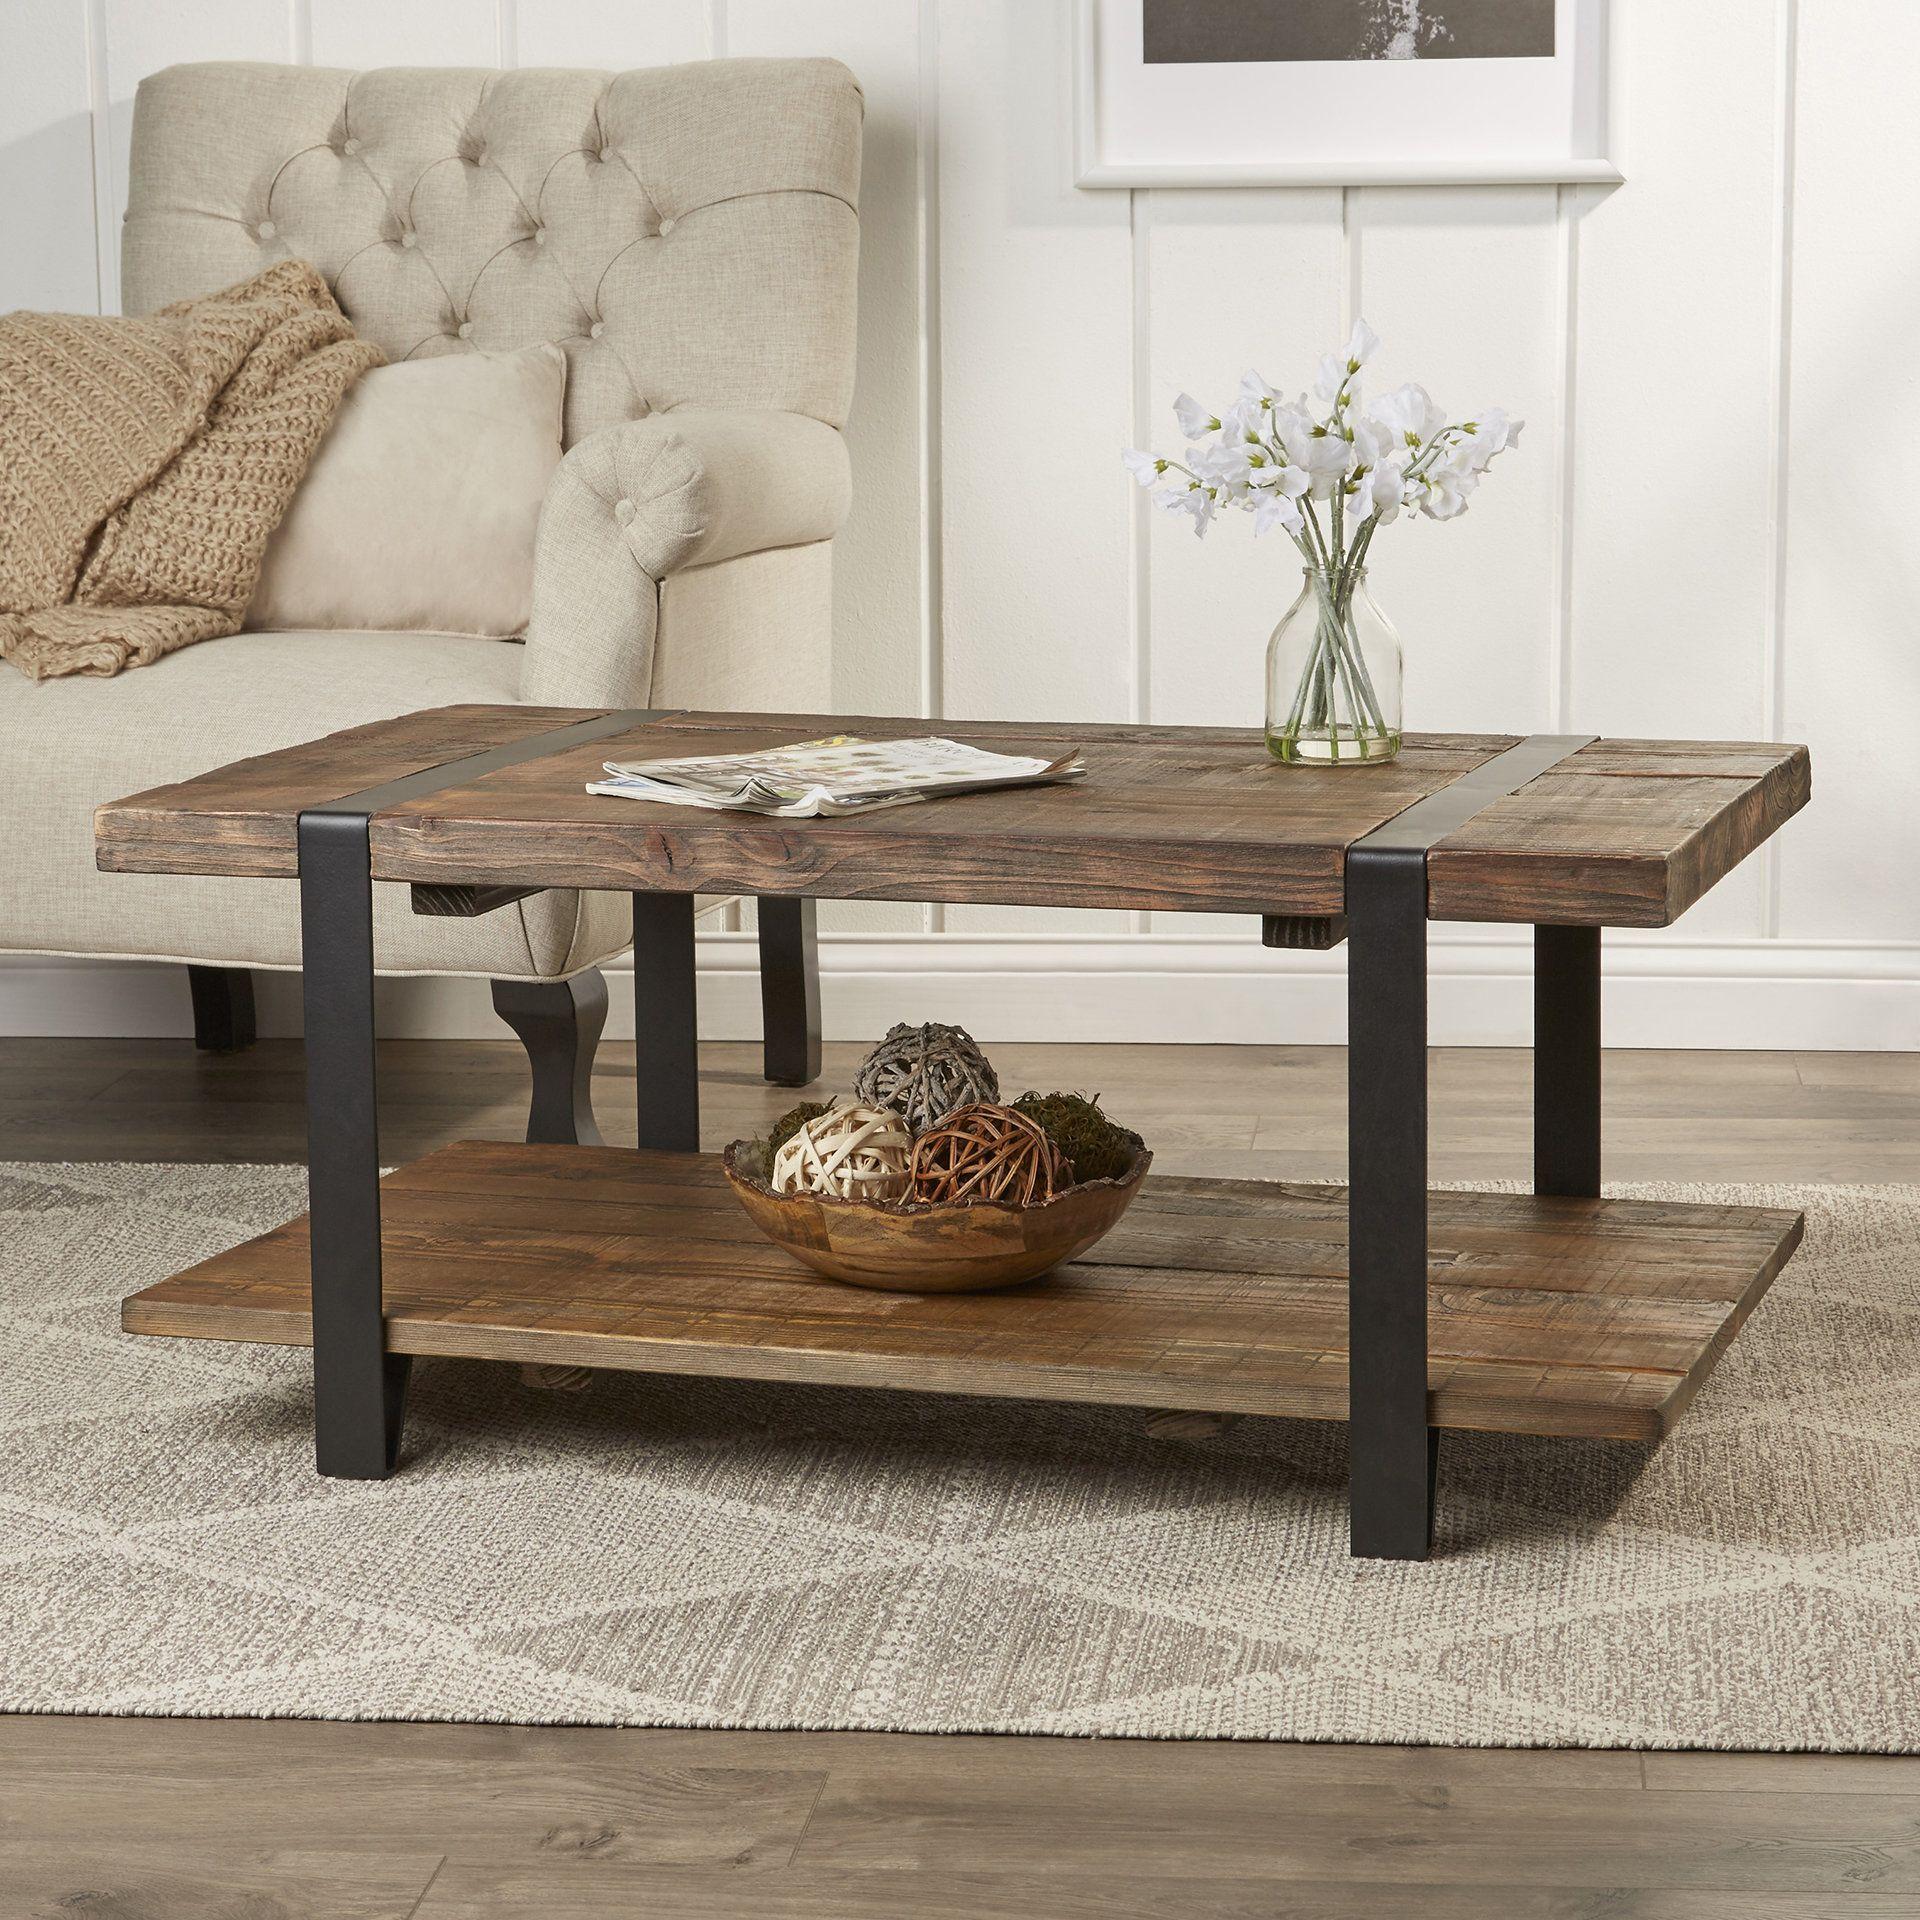 Cruz coffee table furniture rustic coffee tables